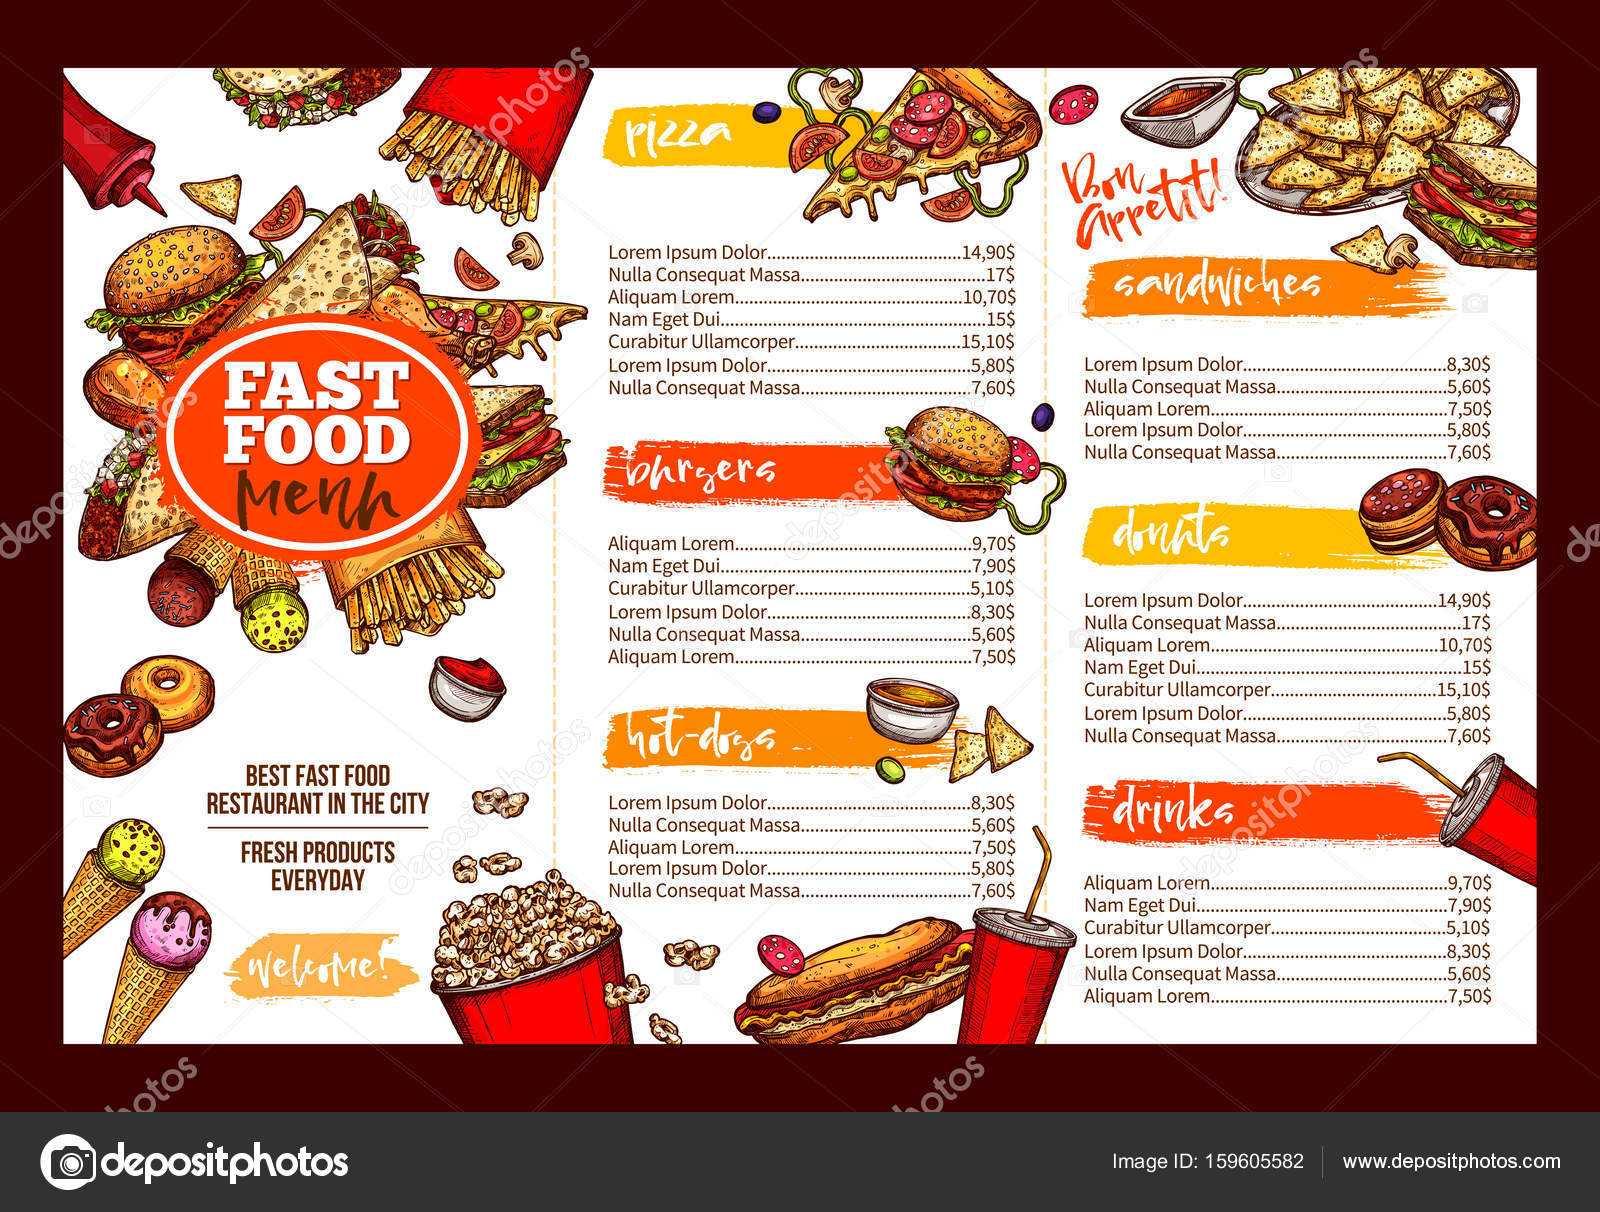 Restaurants Brochure Templates | Fast Food Restaurant Menu Throughout Fast Food Menu Design Templates